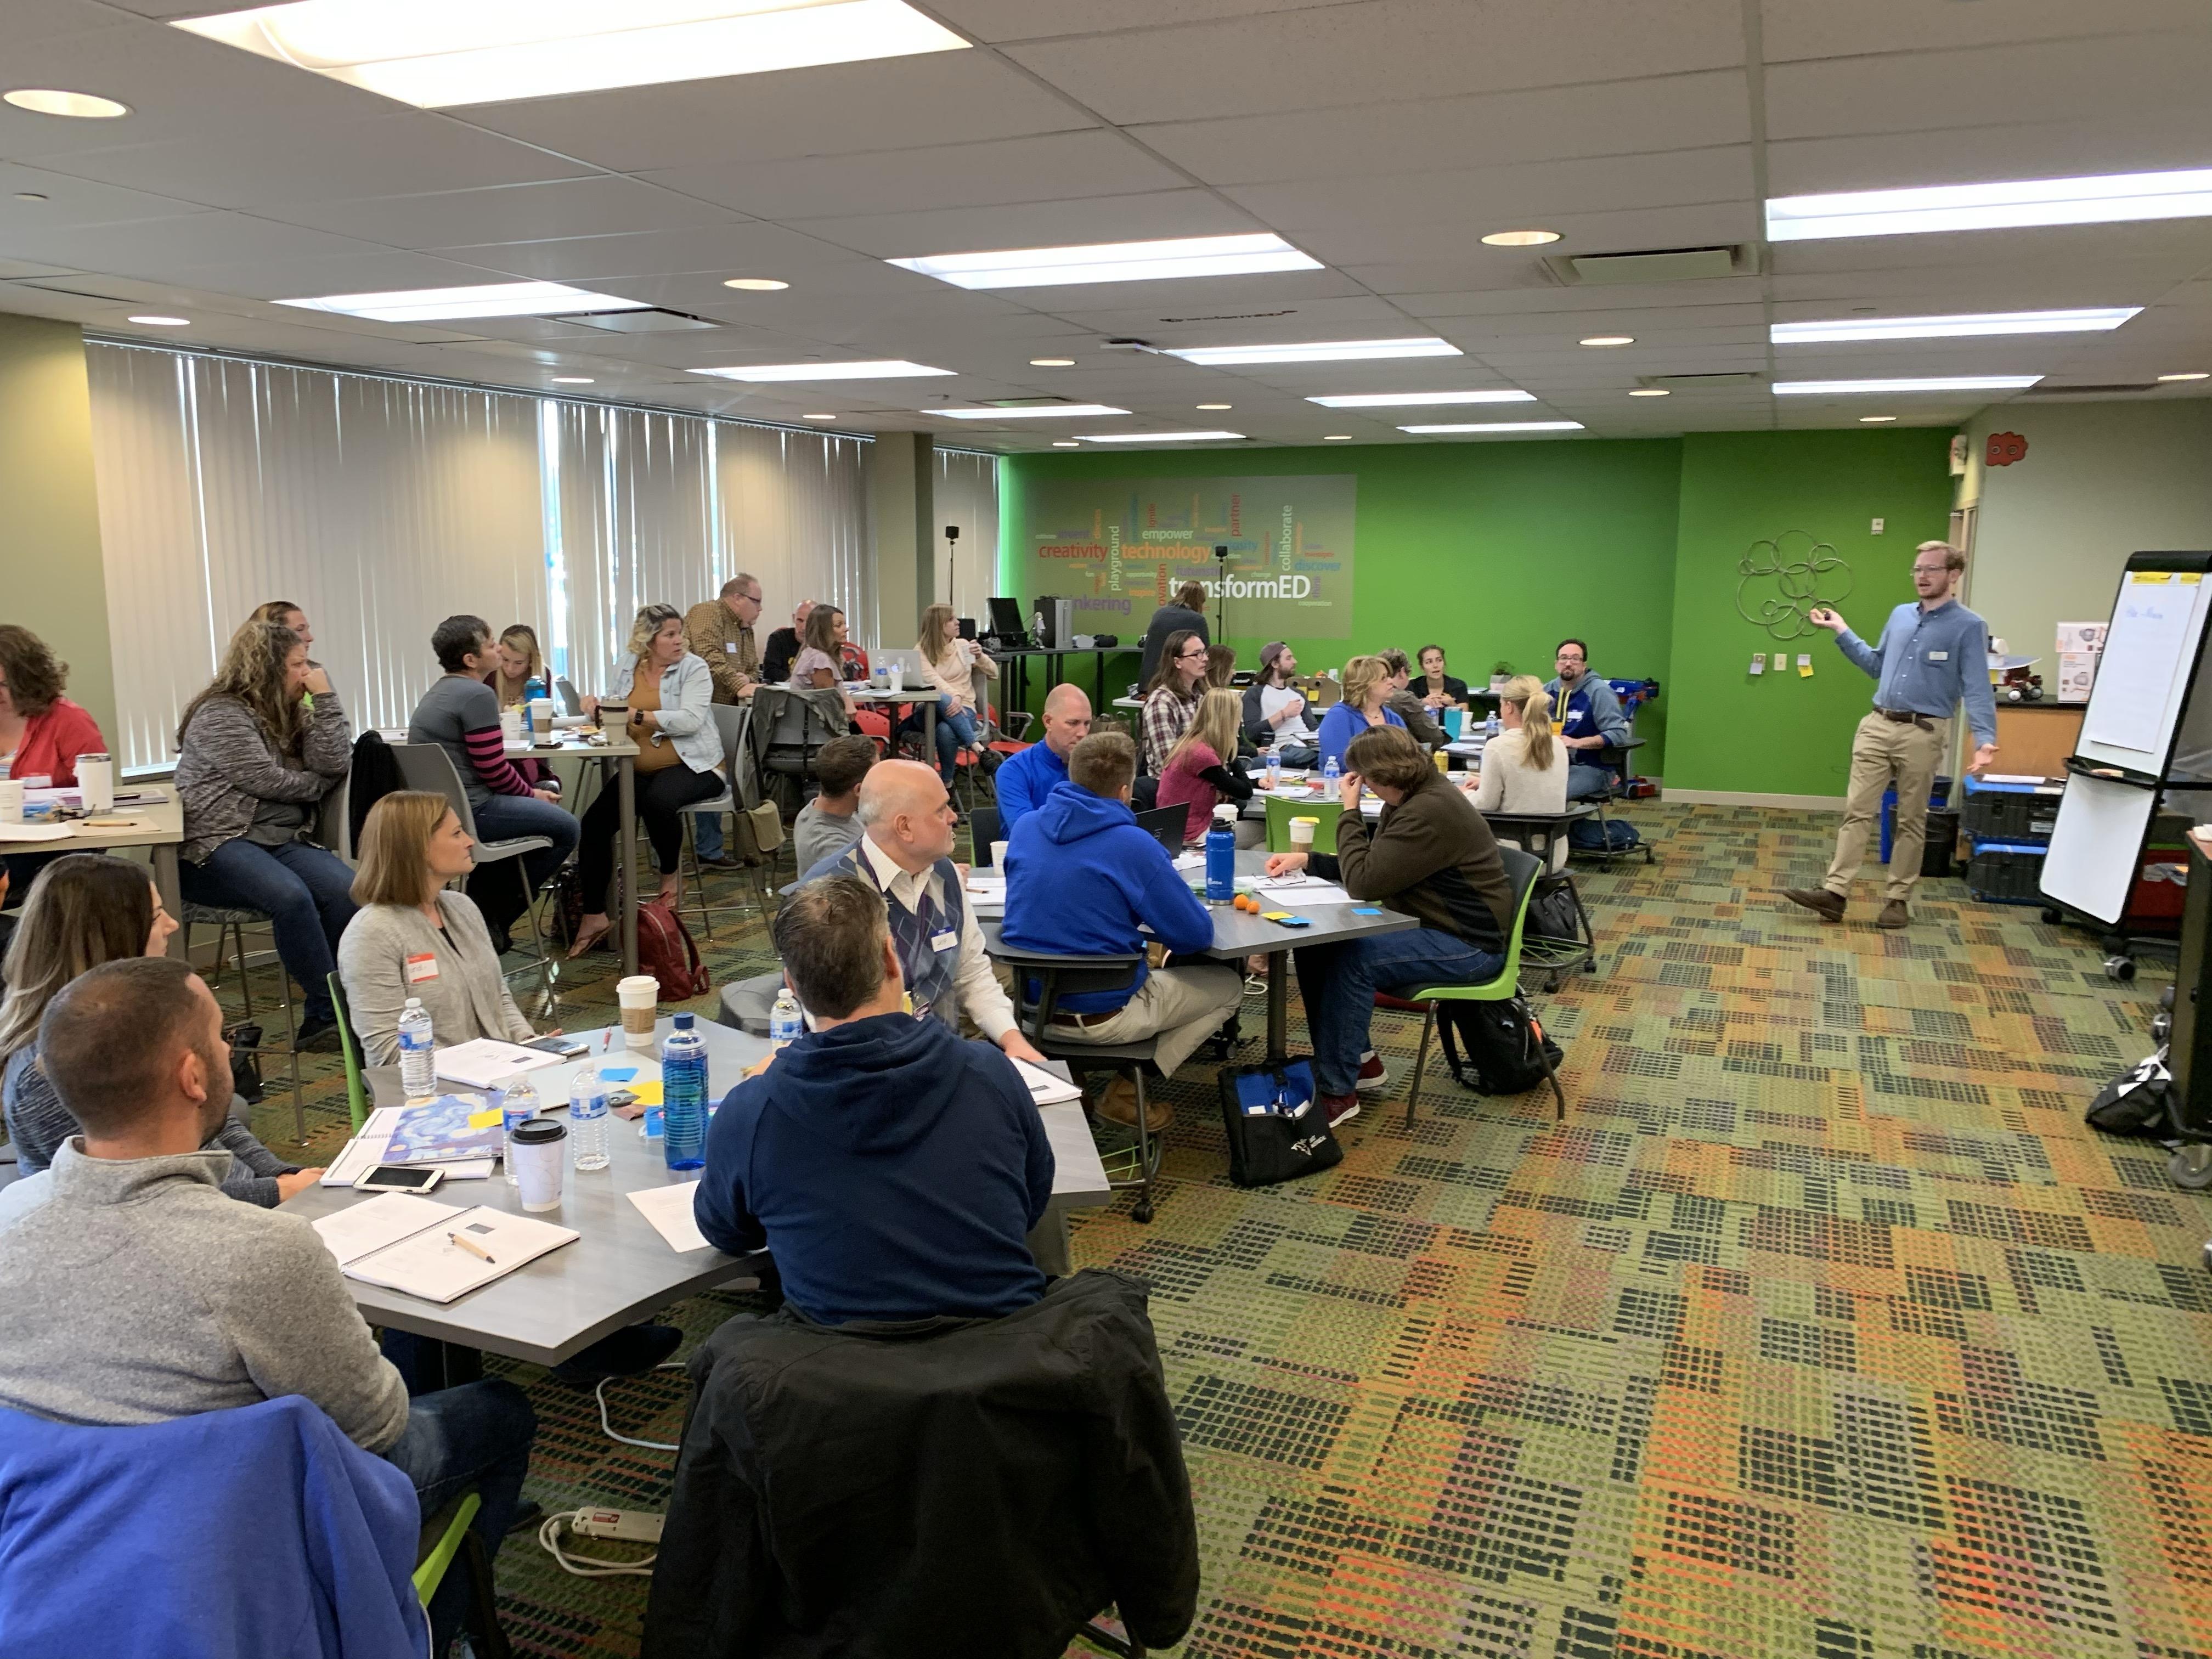 Educators in a STEM education training, listening to presentation on renewable energy